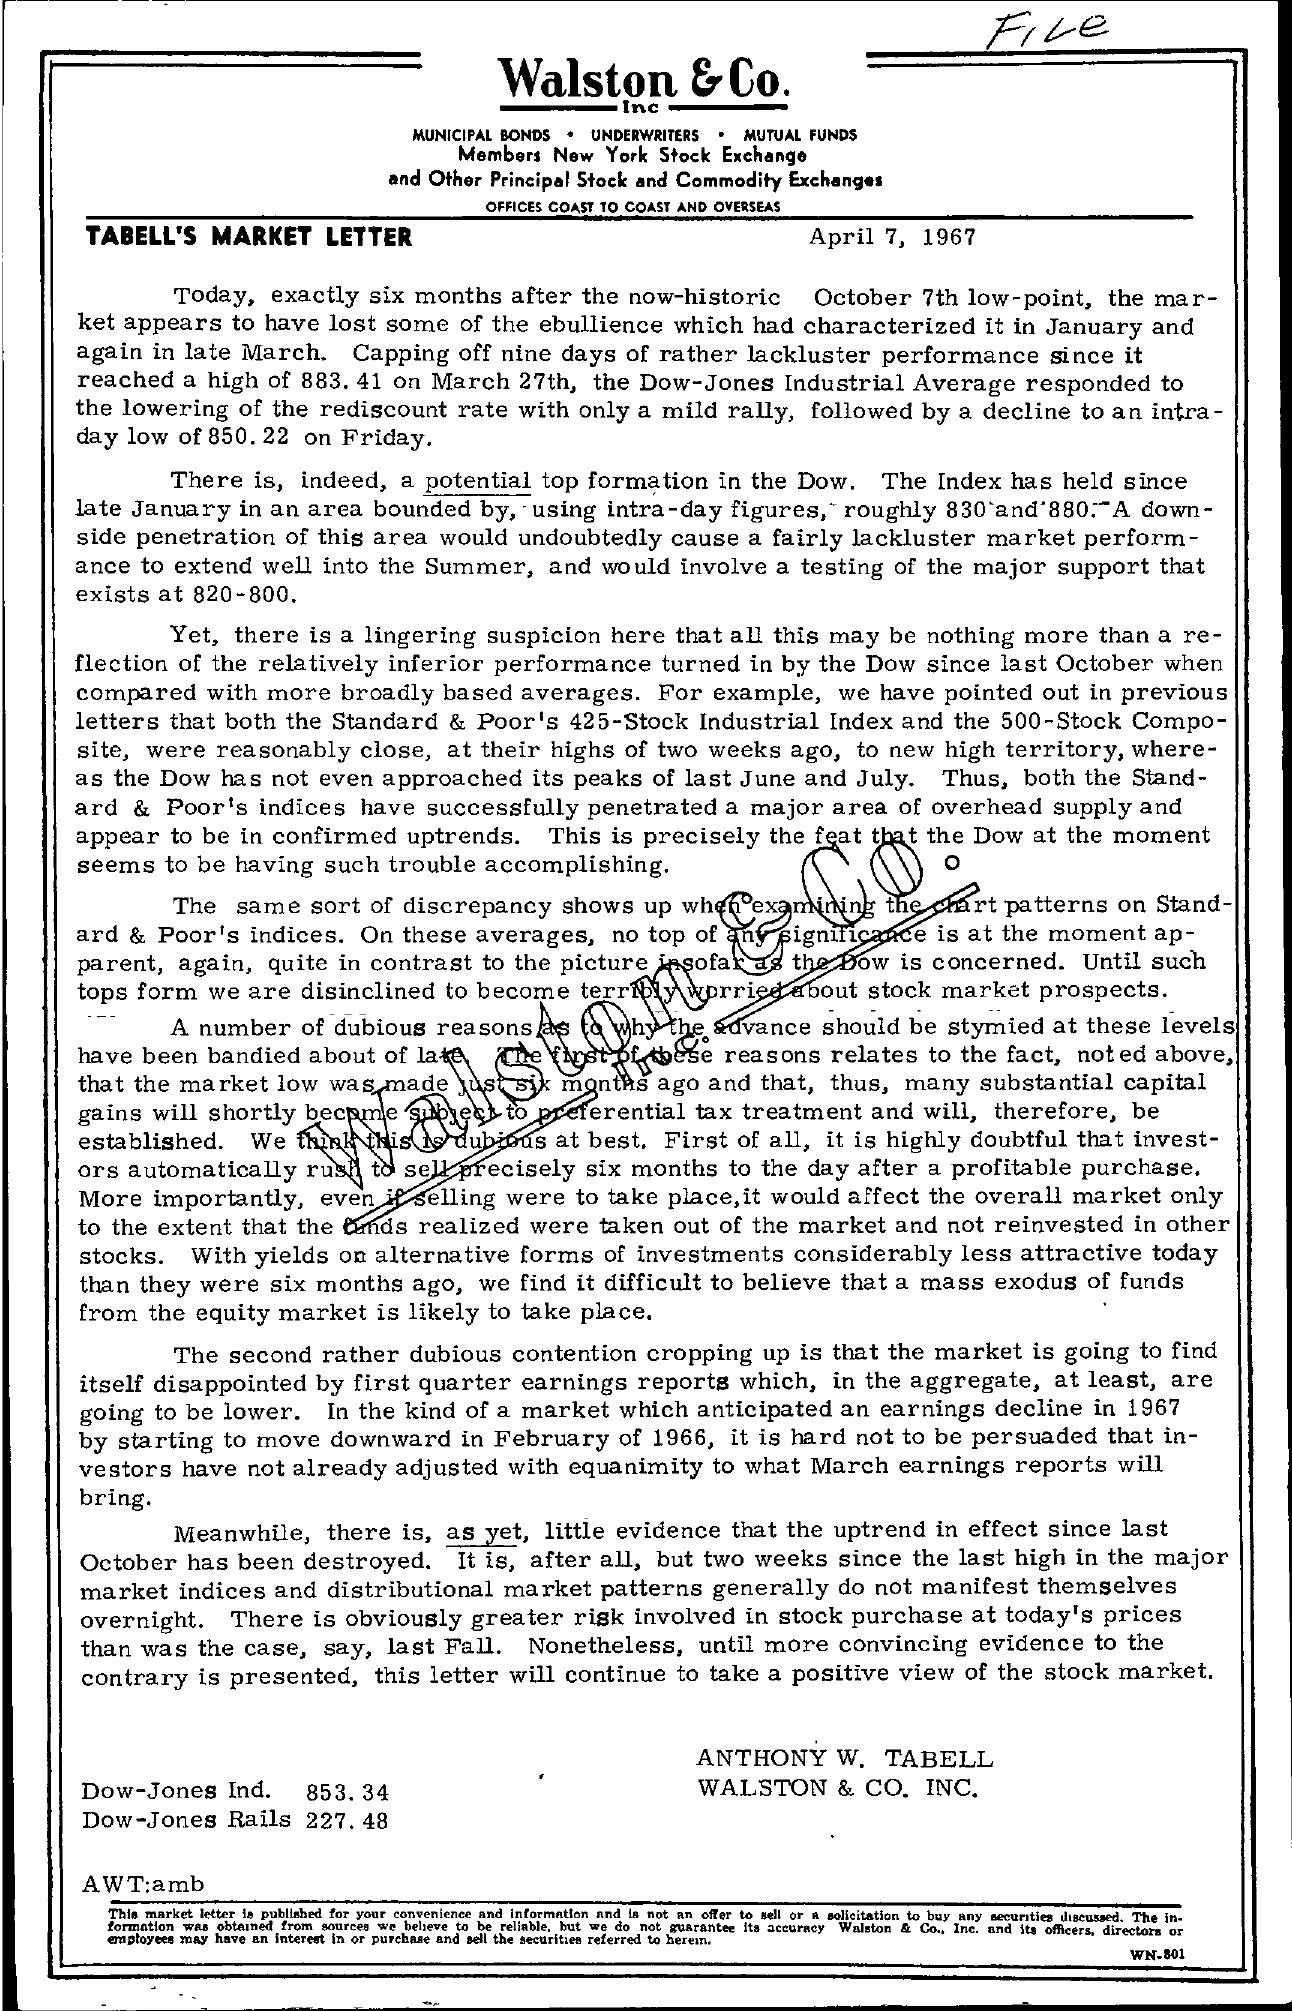 Tabell's Market Letter - April 07, 1967